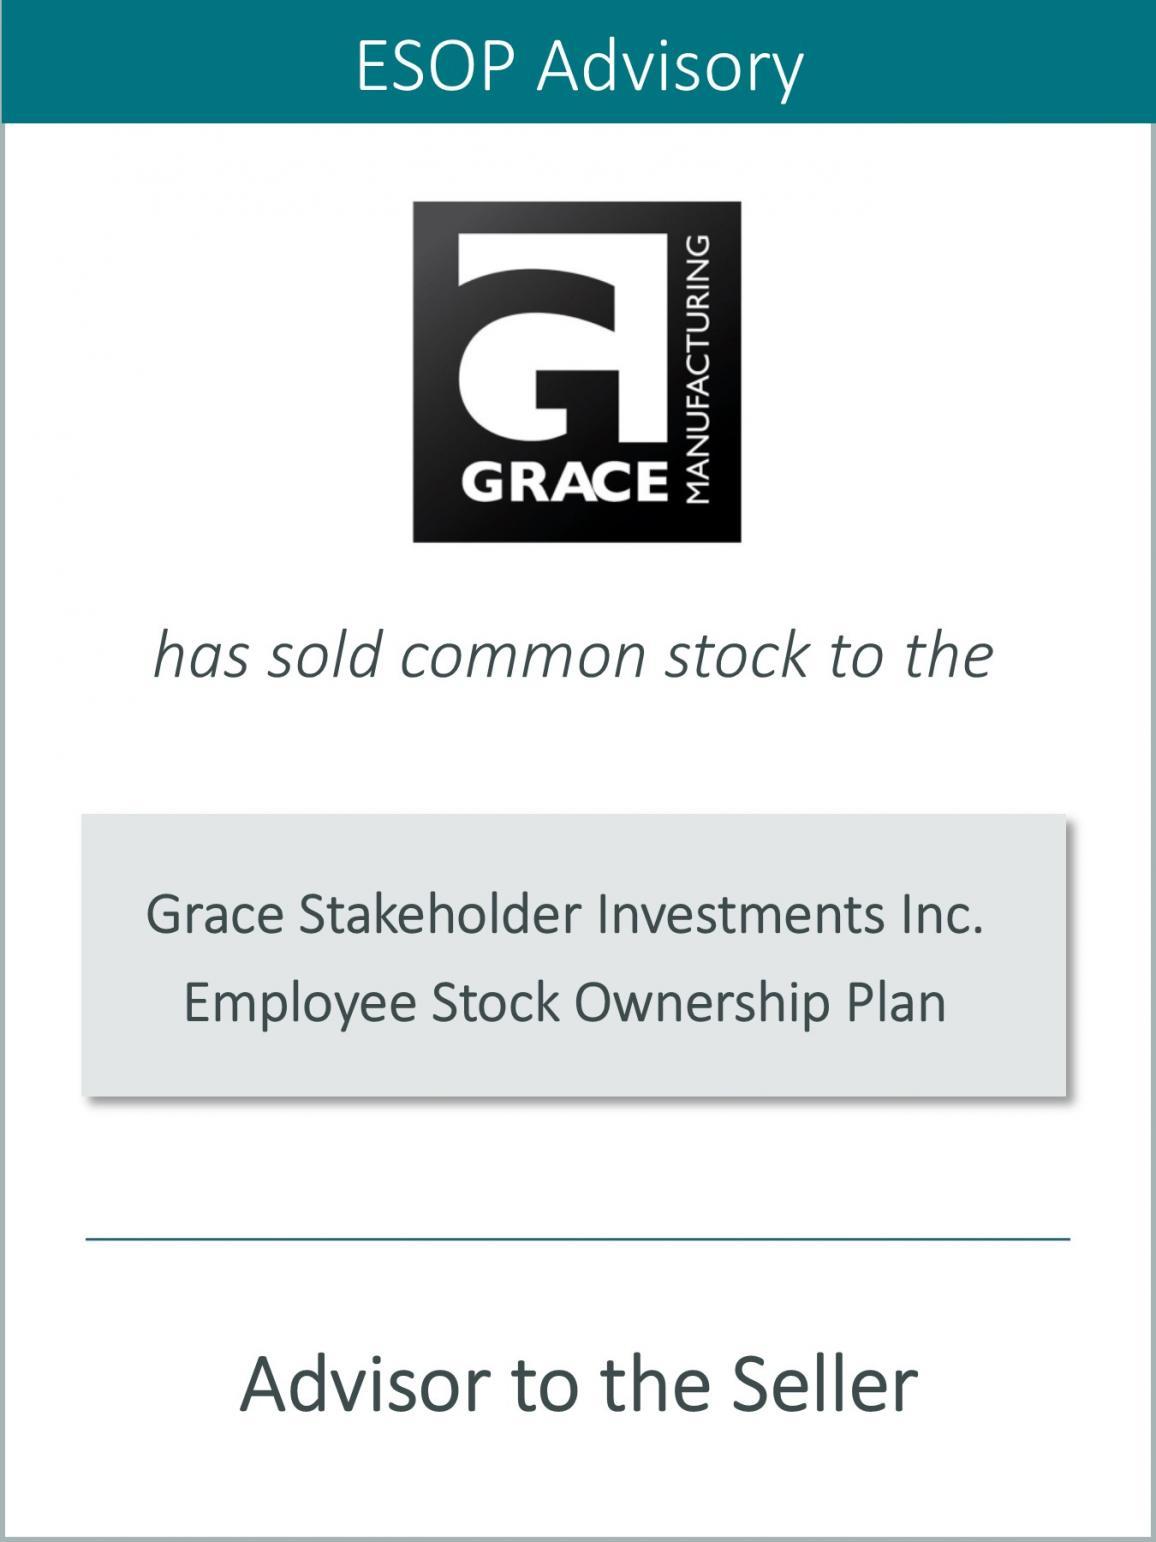 Grace Manufacturing establishes an Employee Stock Ownership Plan (ESO)